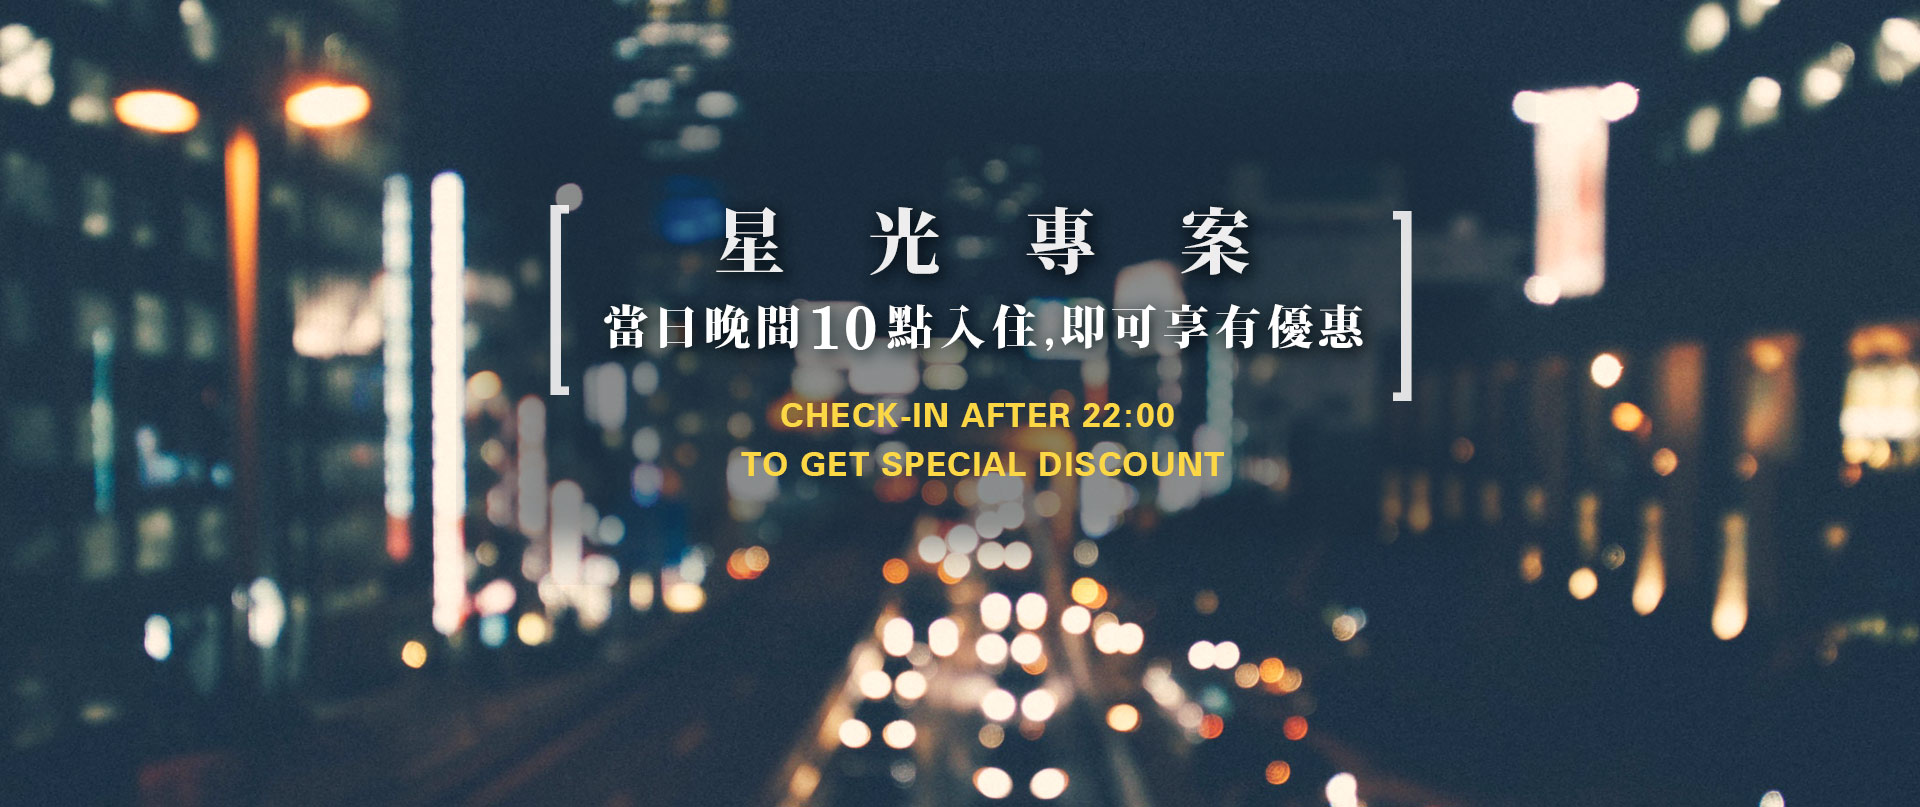 https://booking.taipeiinngroup.com/nv/images/suite/915_103thumb.jpg